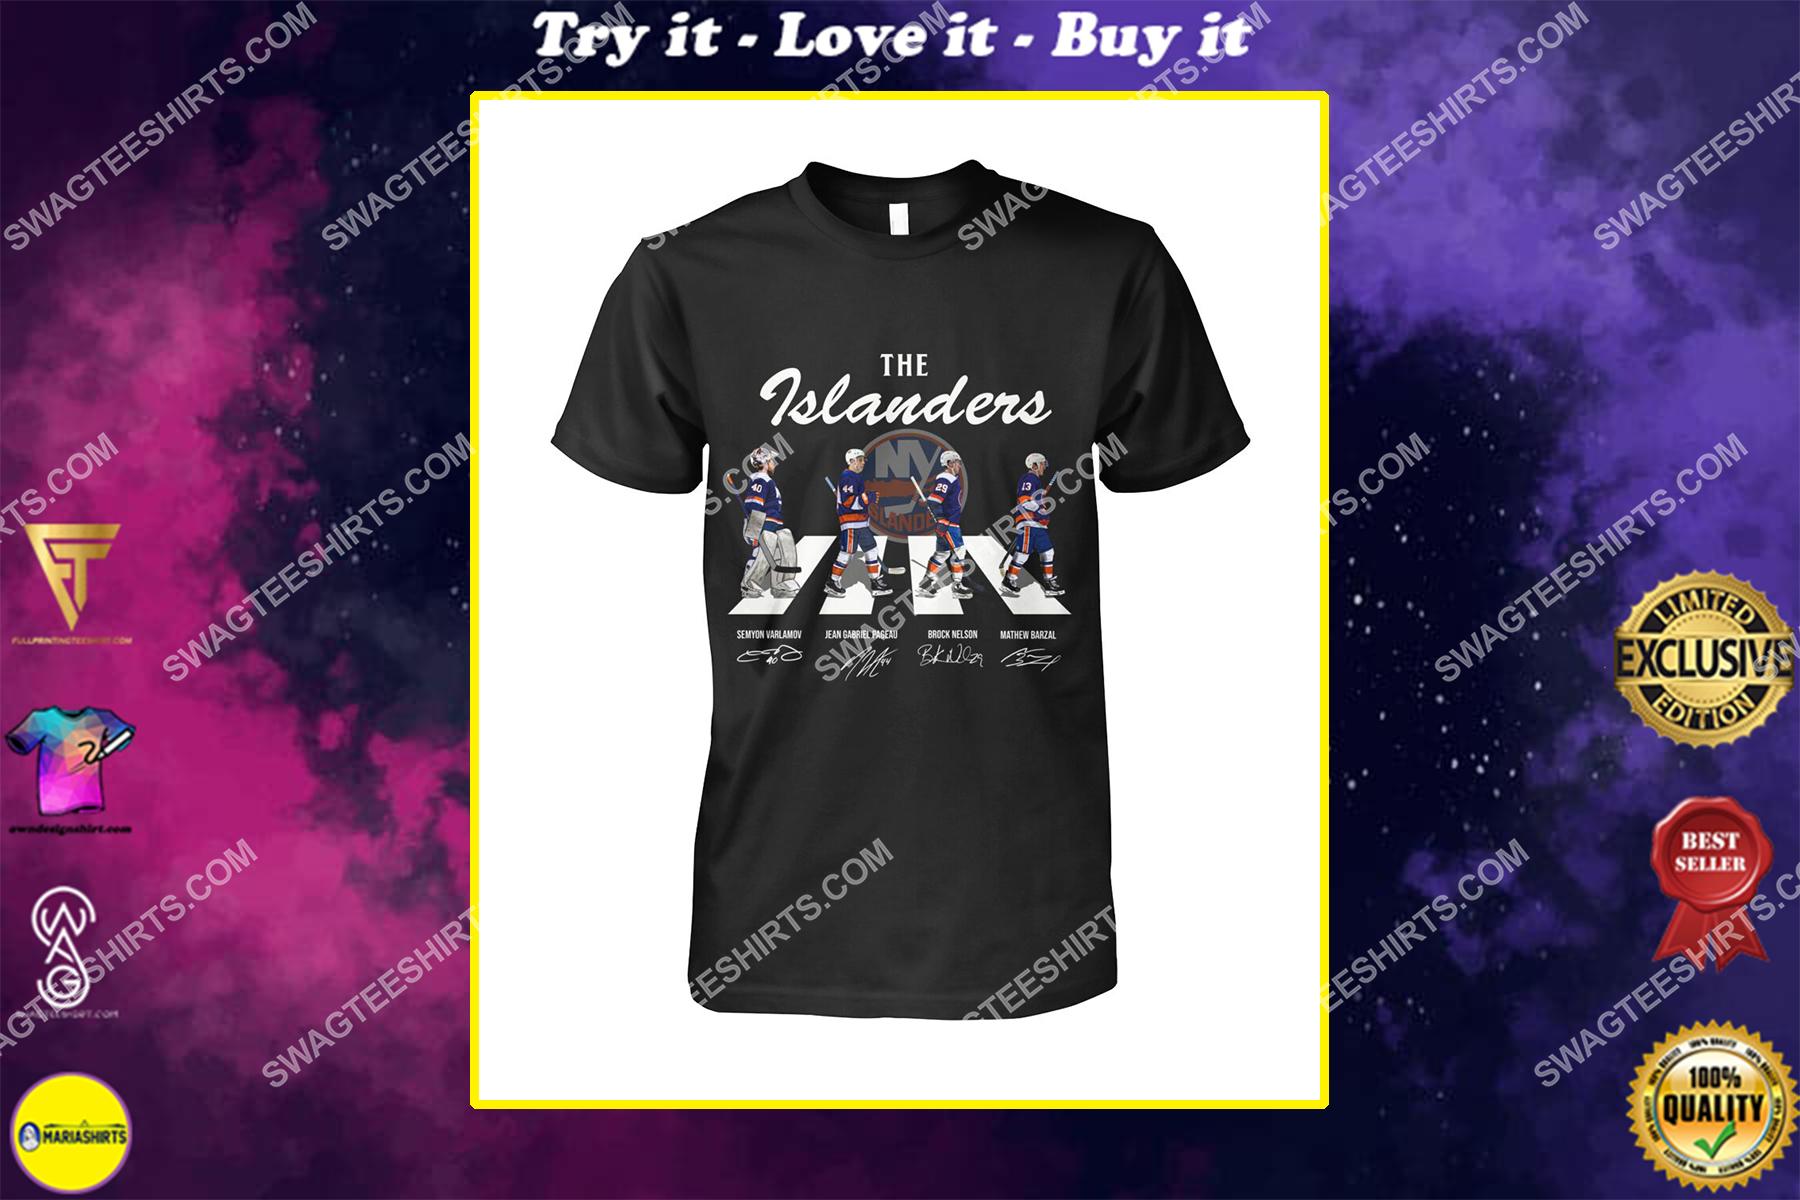 the new york islanders walking abbey road shirt